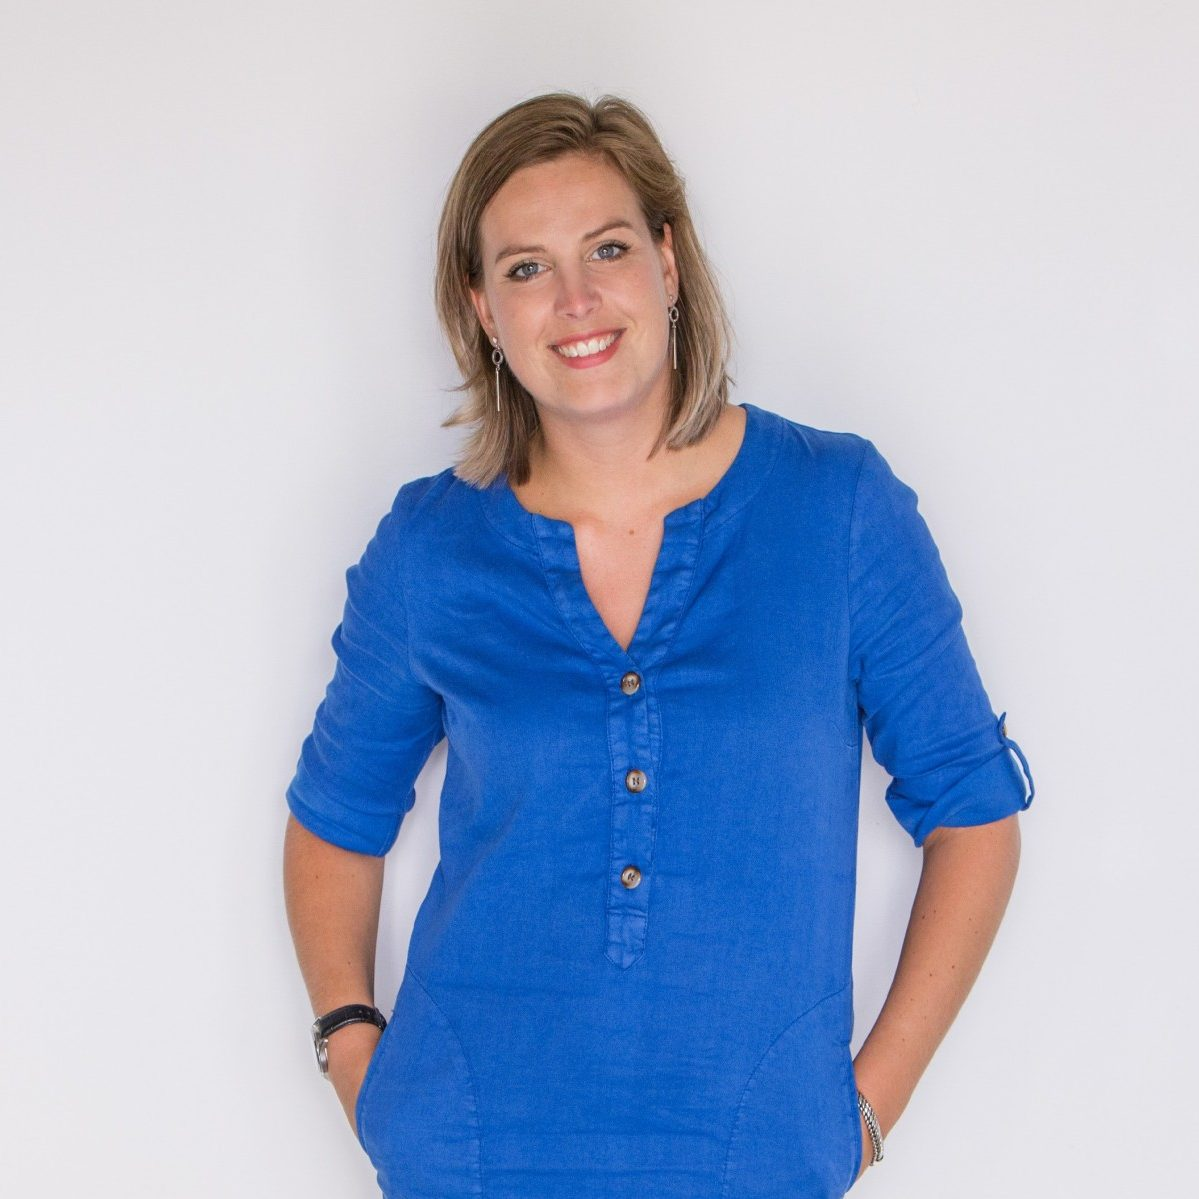 Linda Melenberg